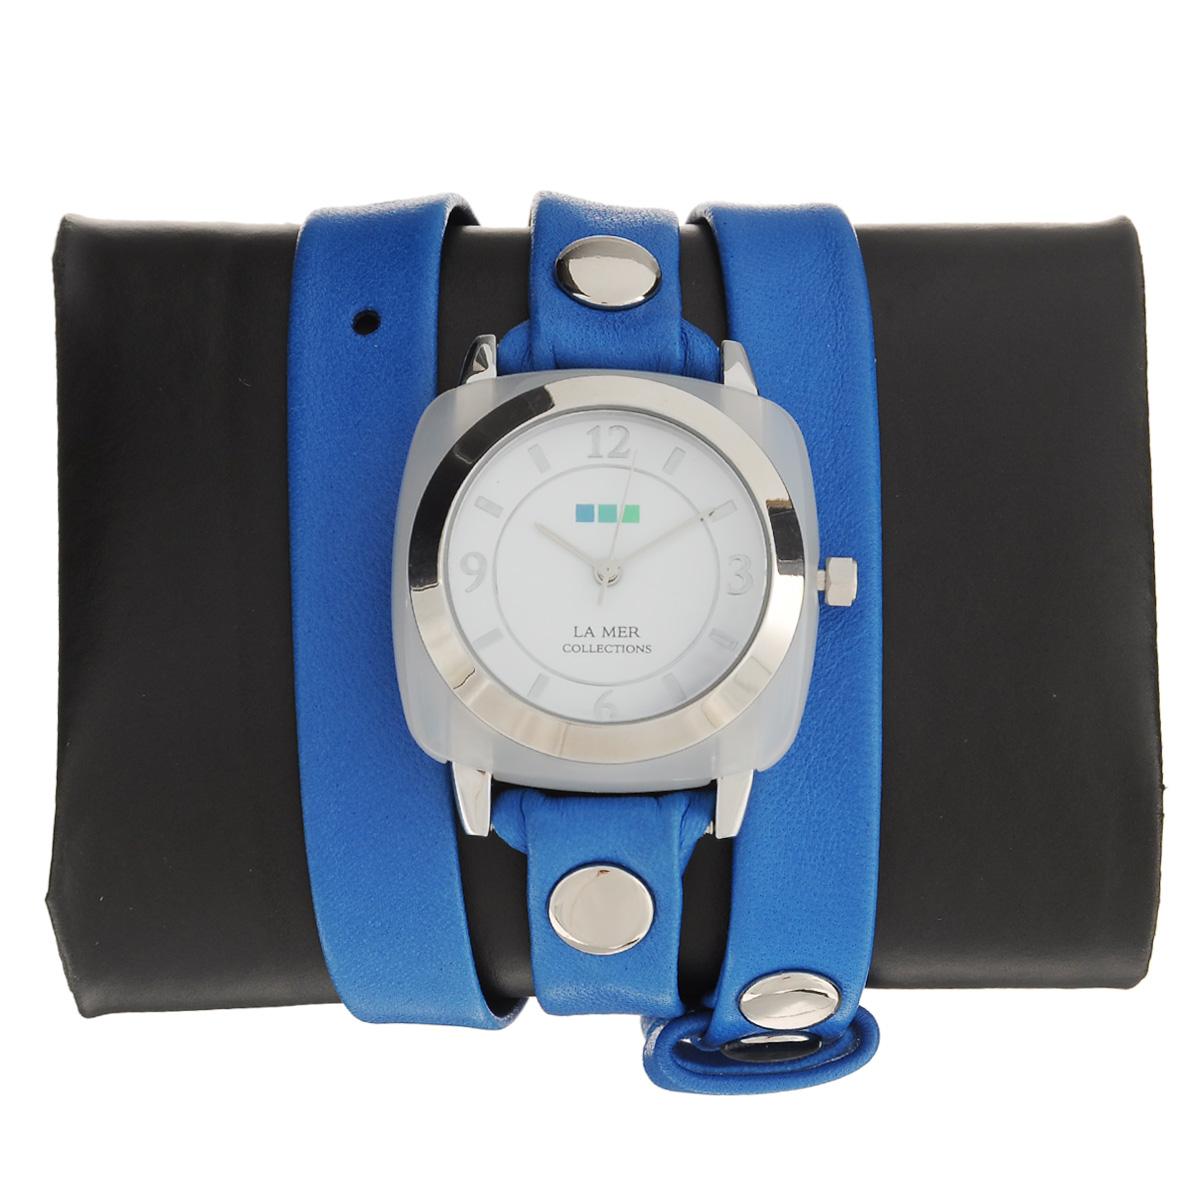 "Часы наручные женские La Mer Collections ""Stone Acetate Moonstone Blue Silver"". LMACETATE008 ( LMACETATE008 )"